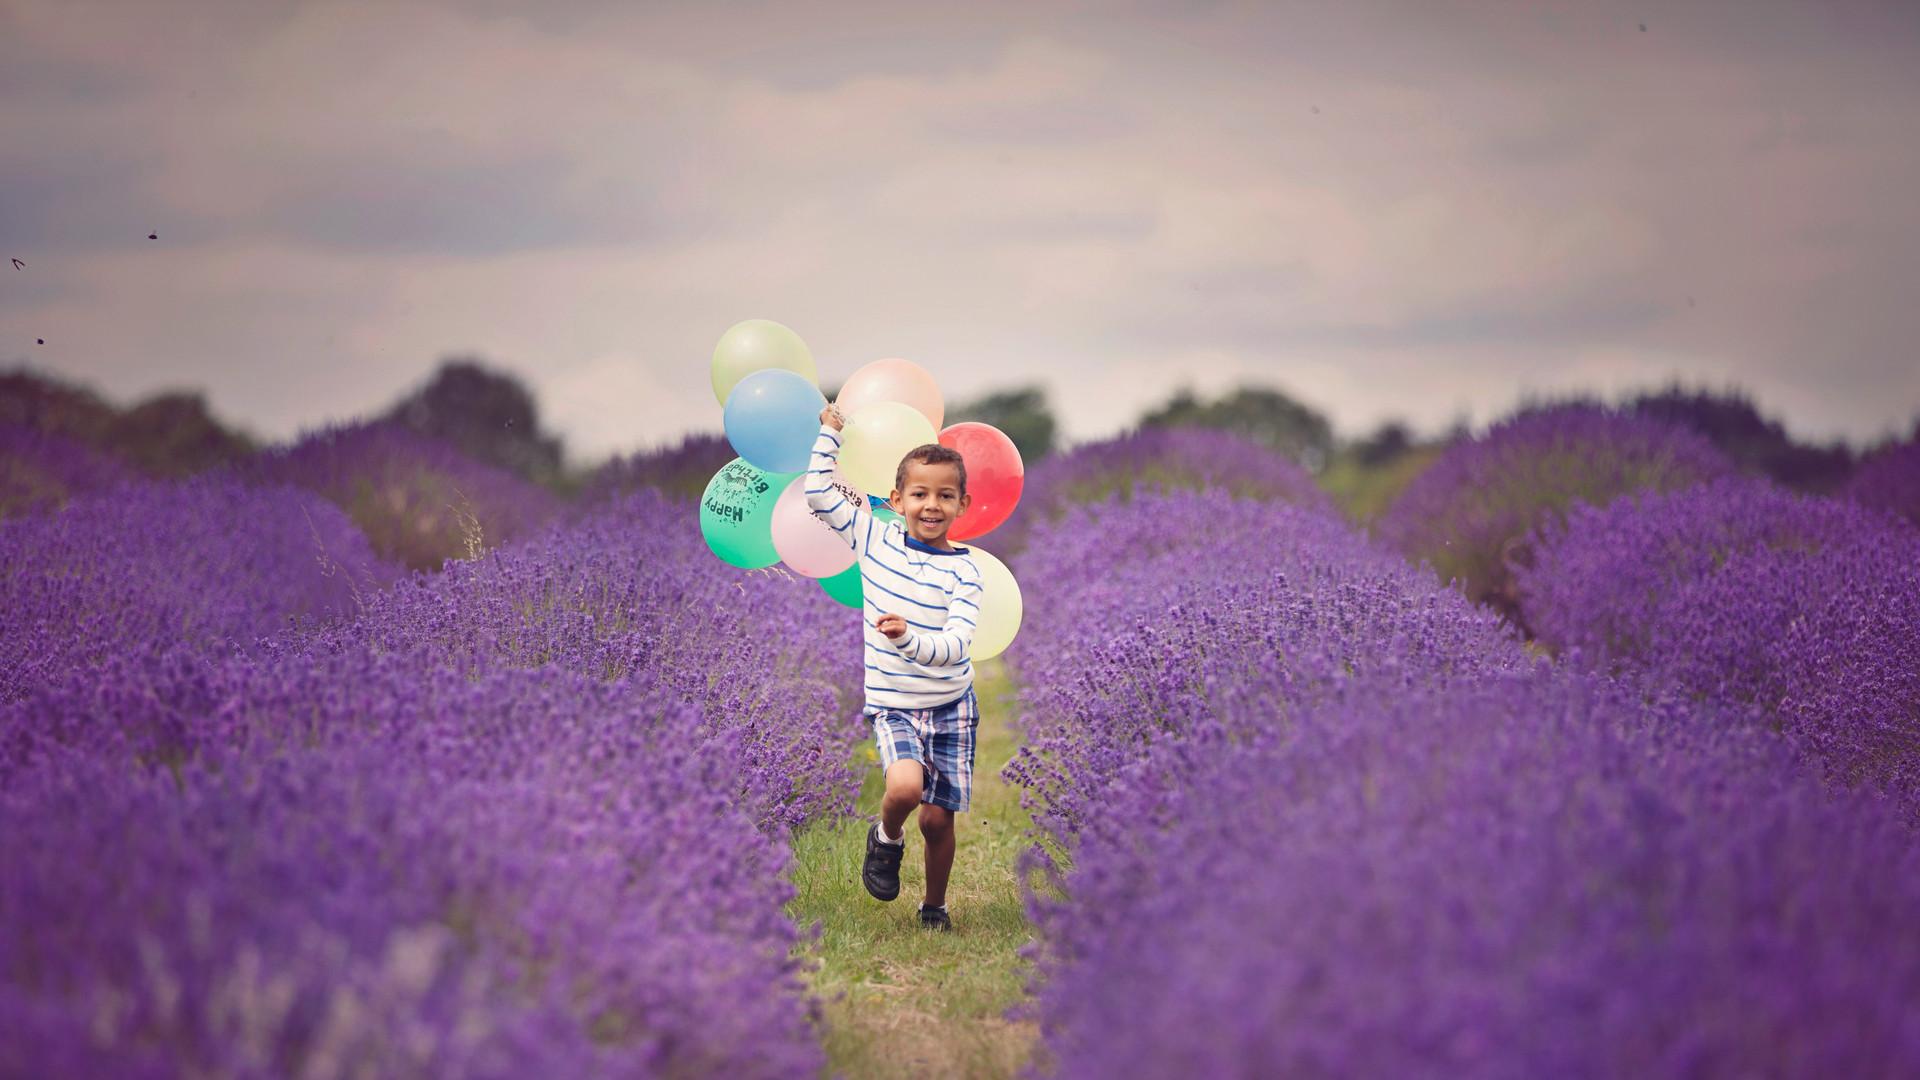 Outdoor_children_photography.jpg